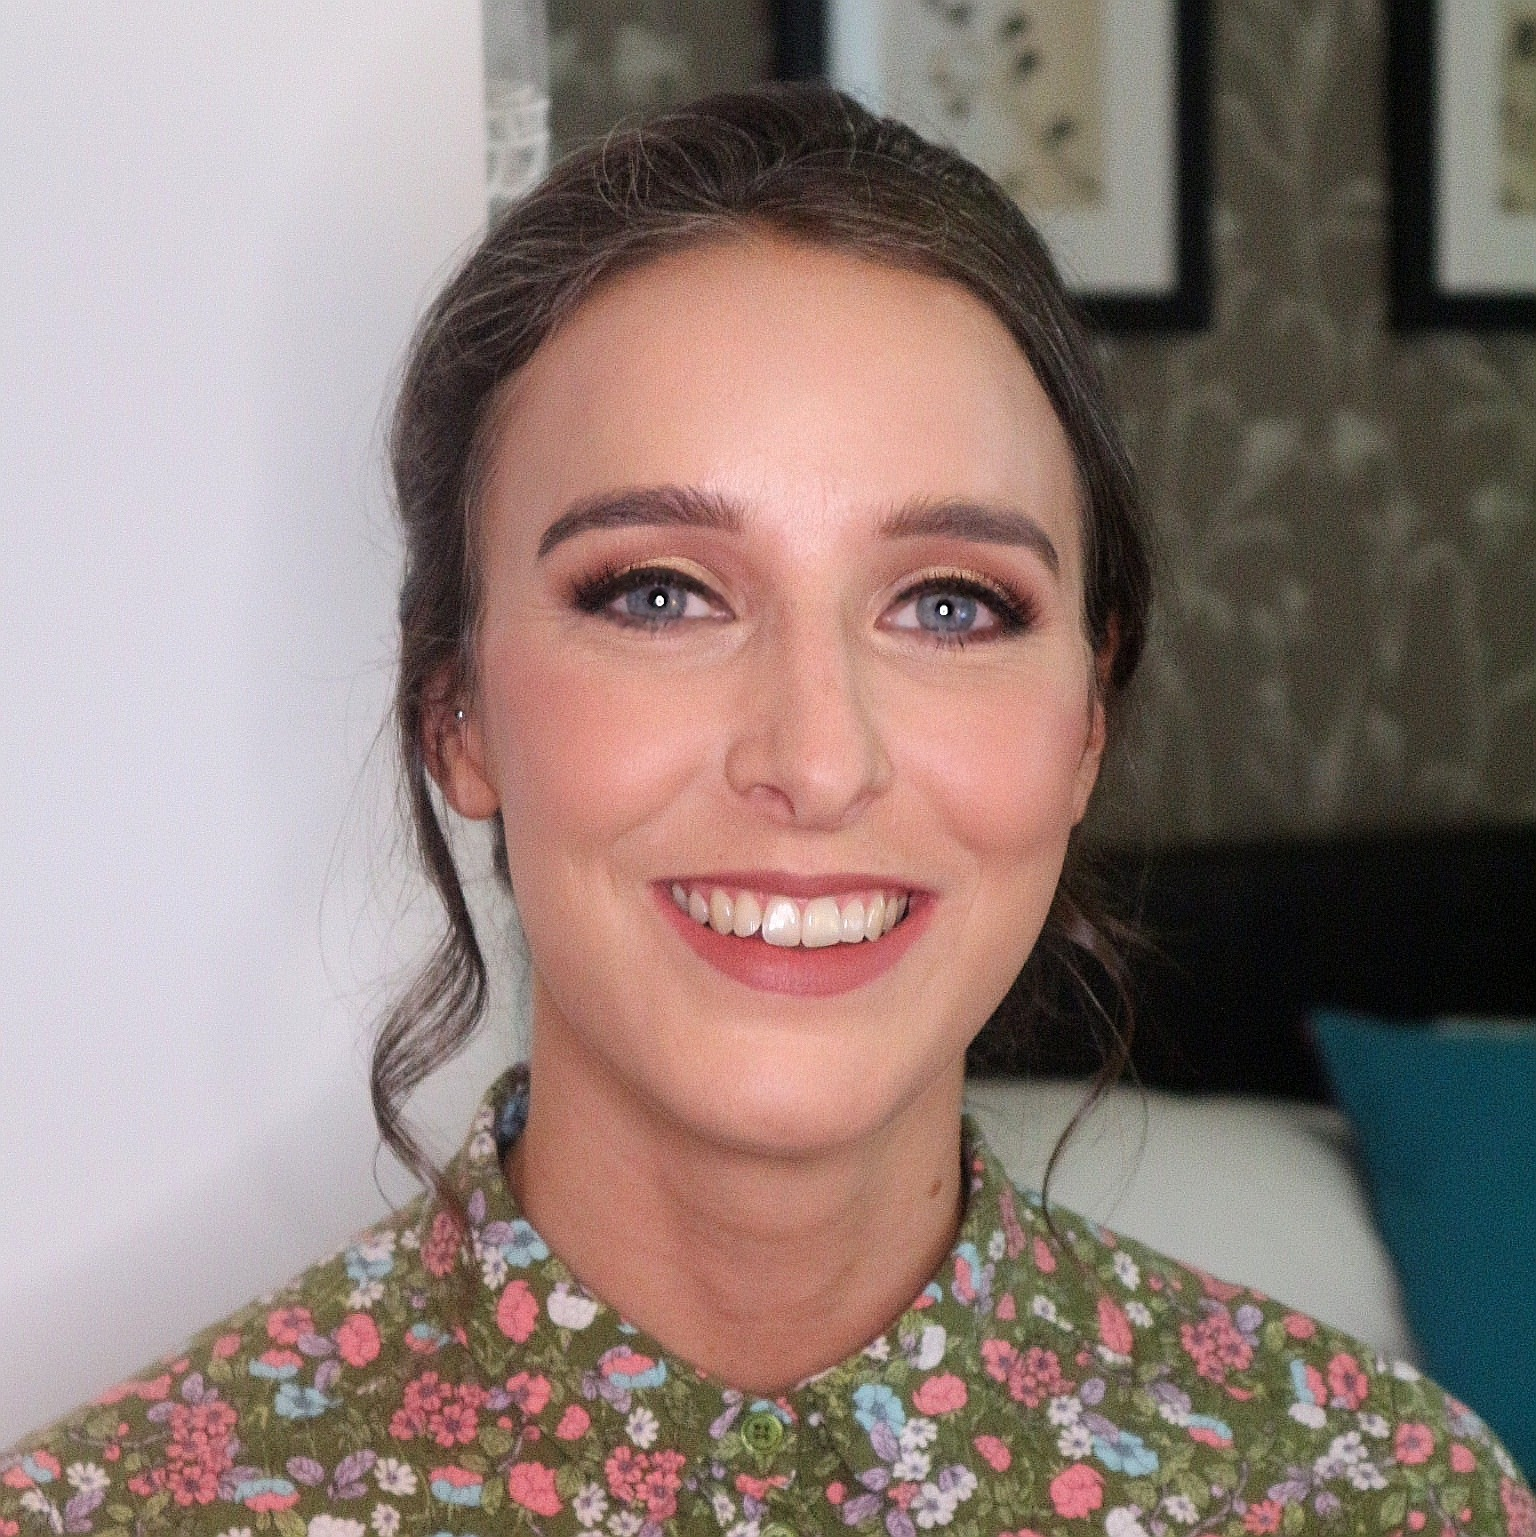 mobile makeup artist Liverpool - wedding makeup Liverpool